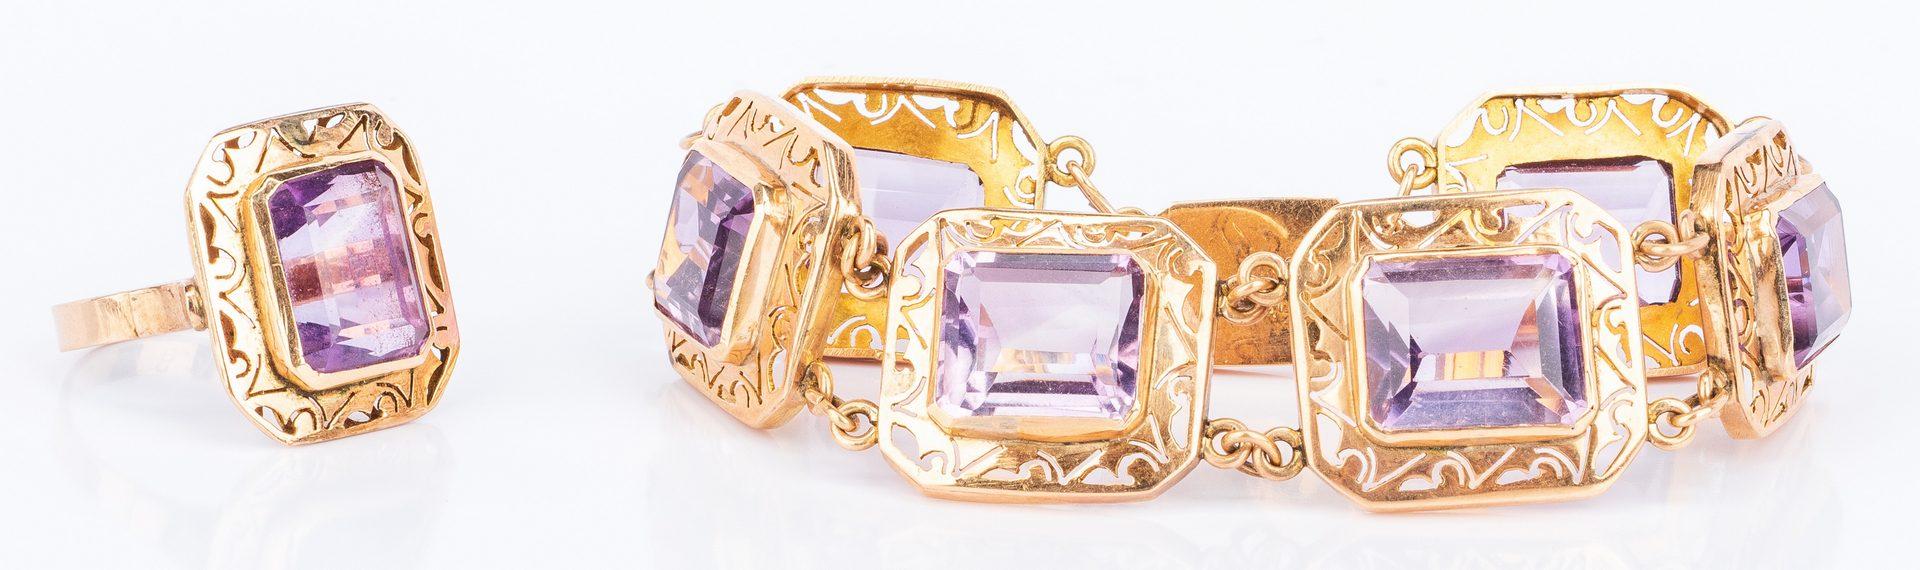 Lot 196: 3 Sets 10K Stone Bracelets w/ Rings